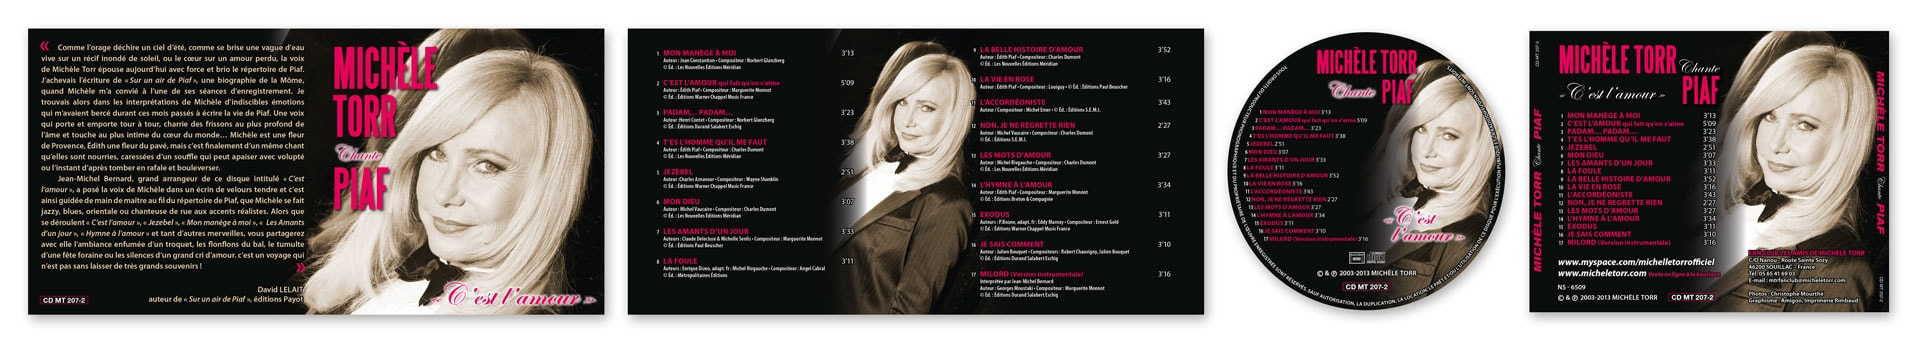 Pochette CD M. Torr Chante Piaf